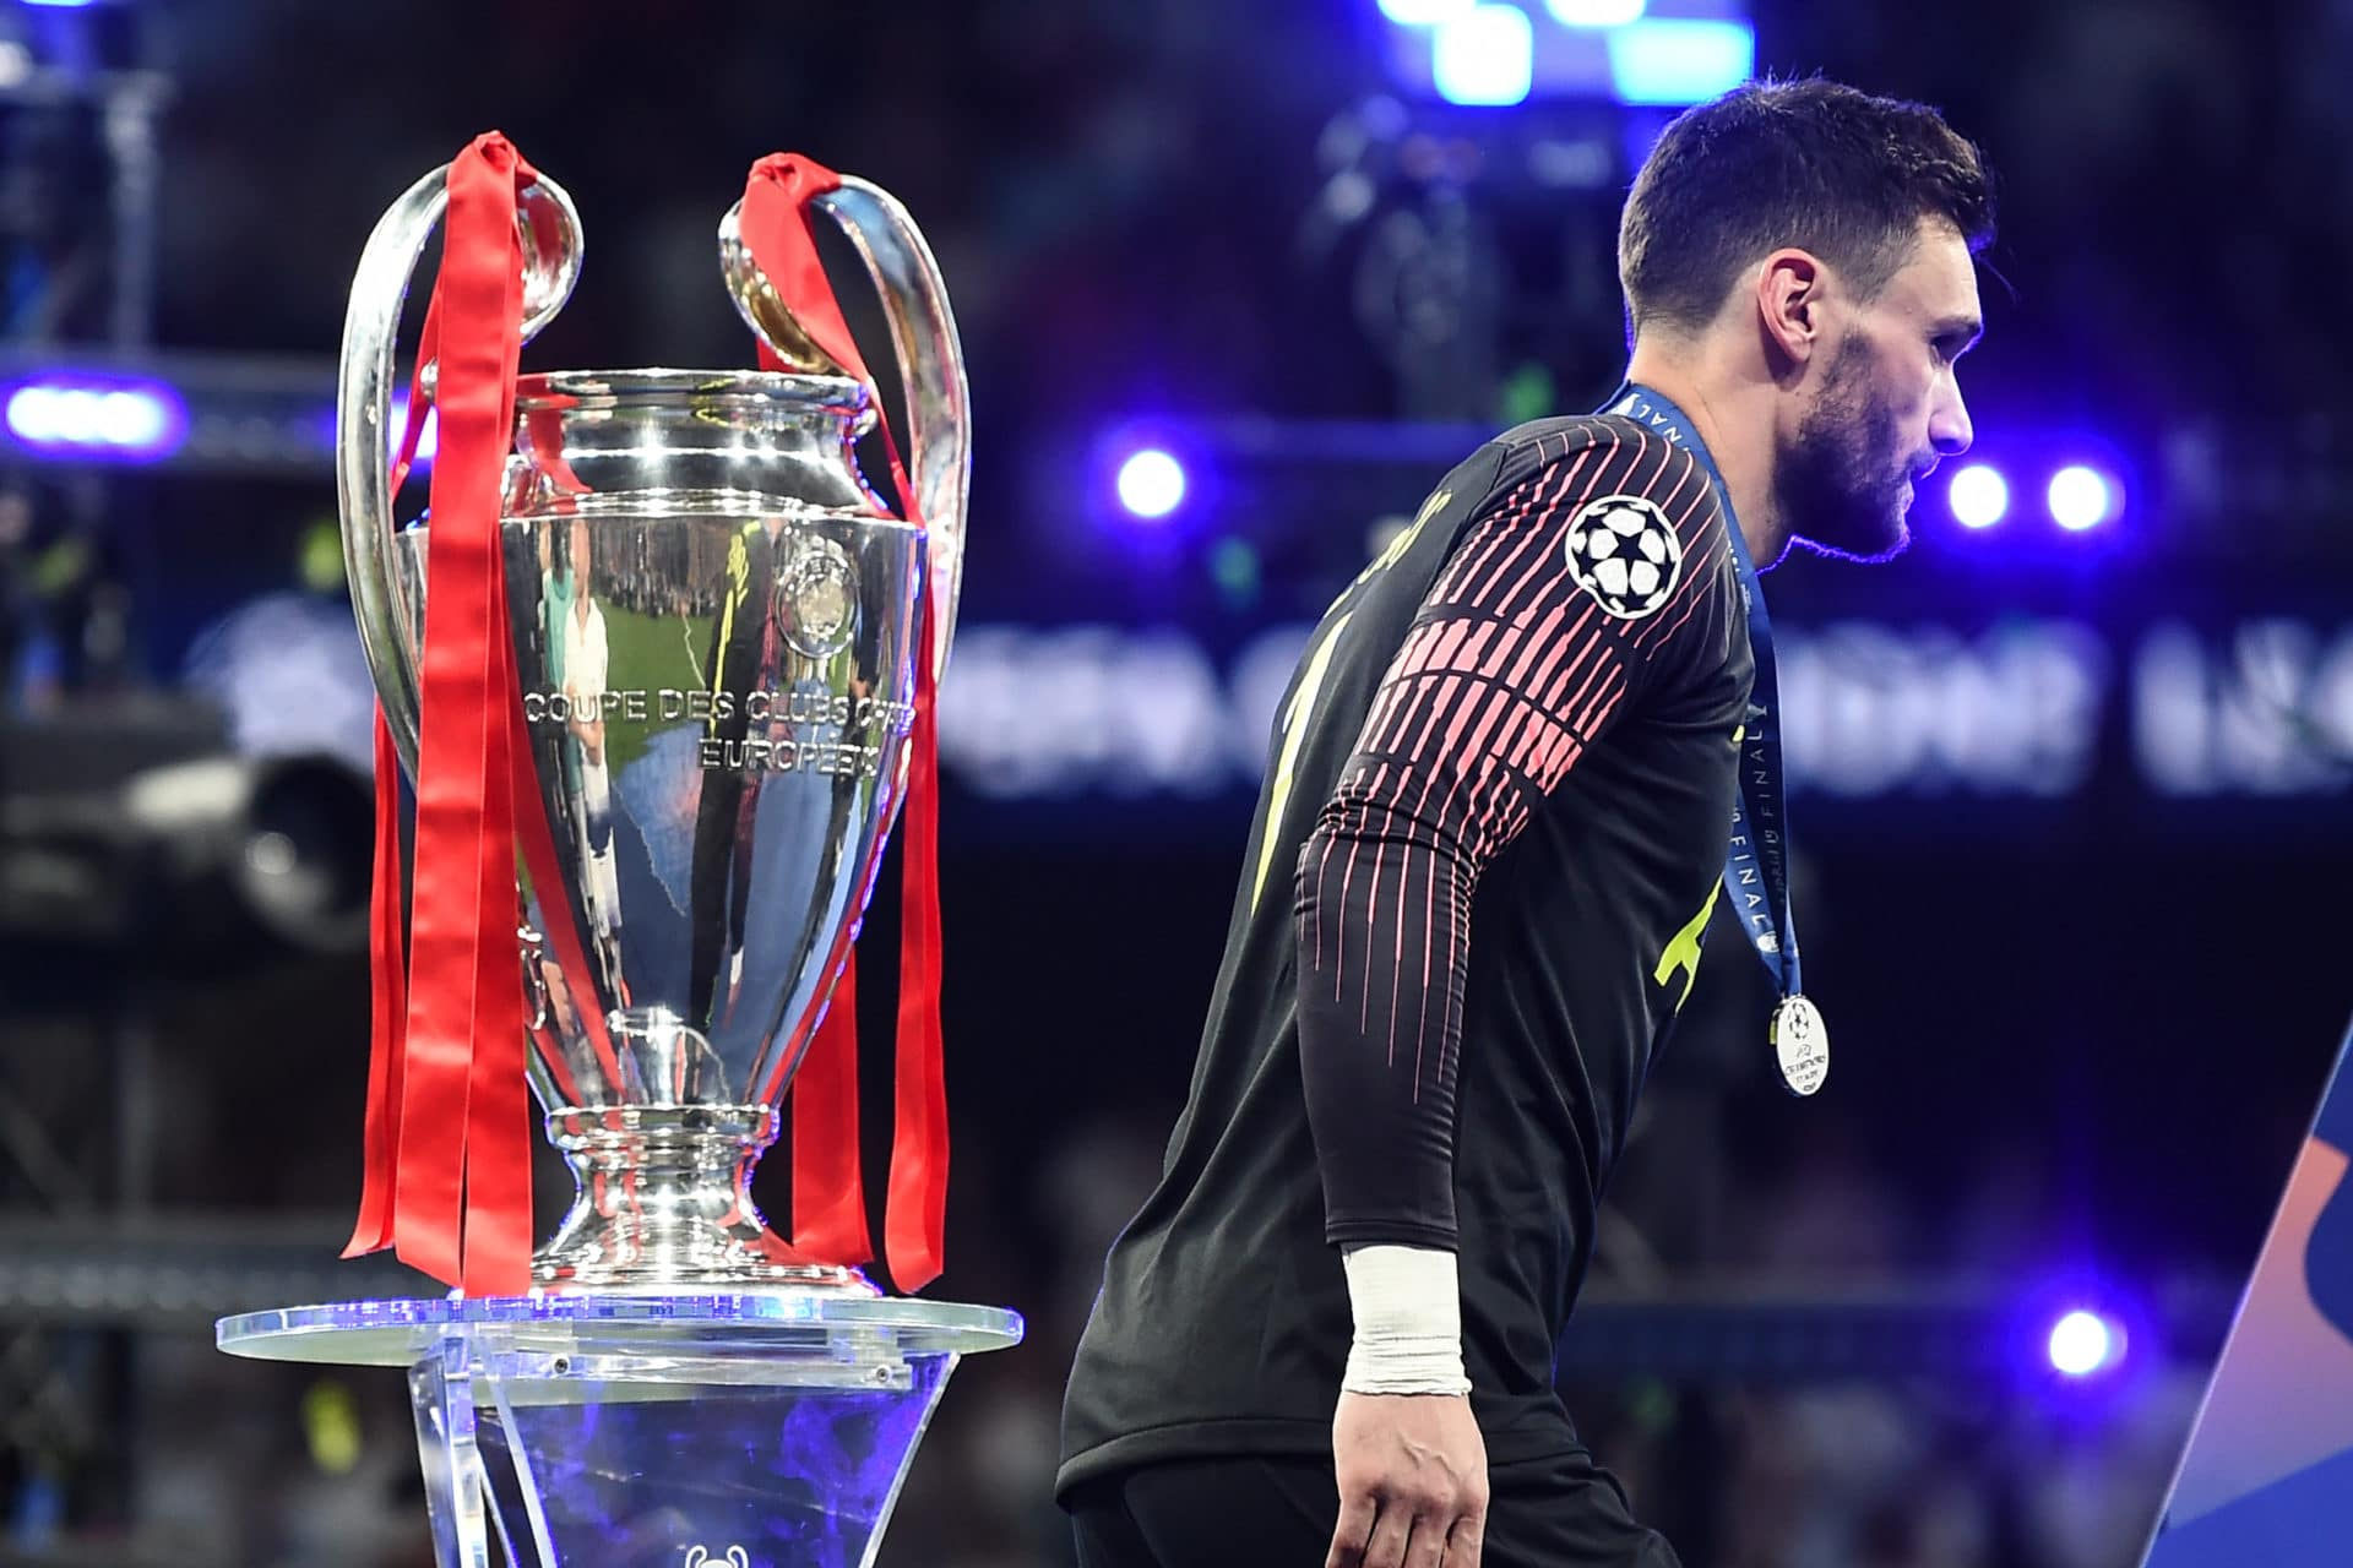 Calendario Champions Juve 2020.Sorteggio Gironi Champions League 2019 2020 Gruppi